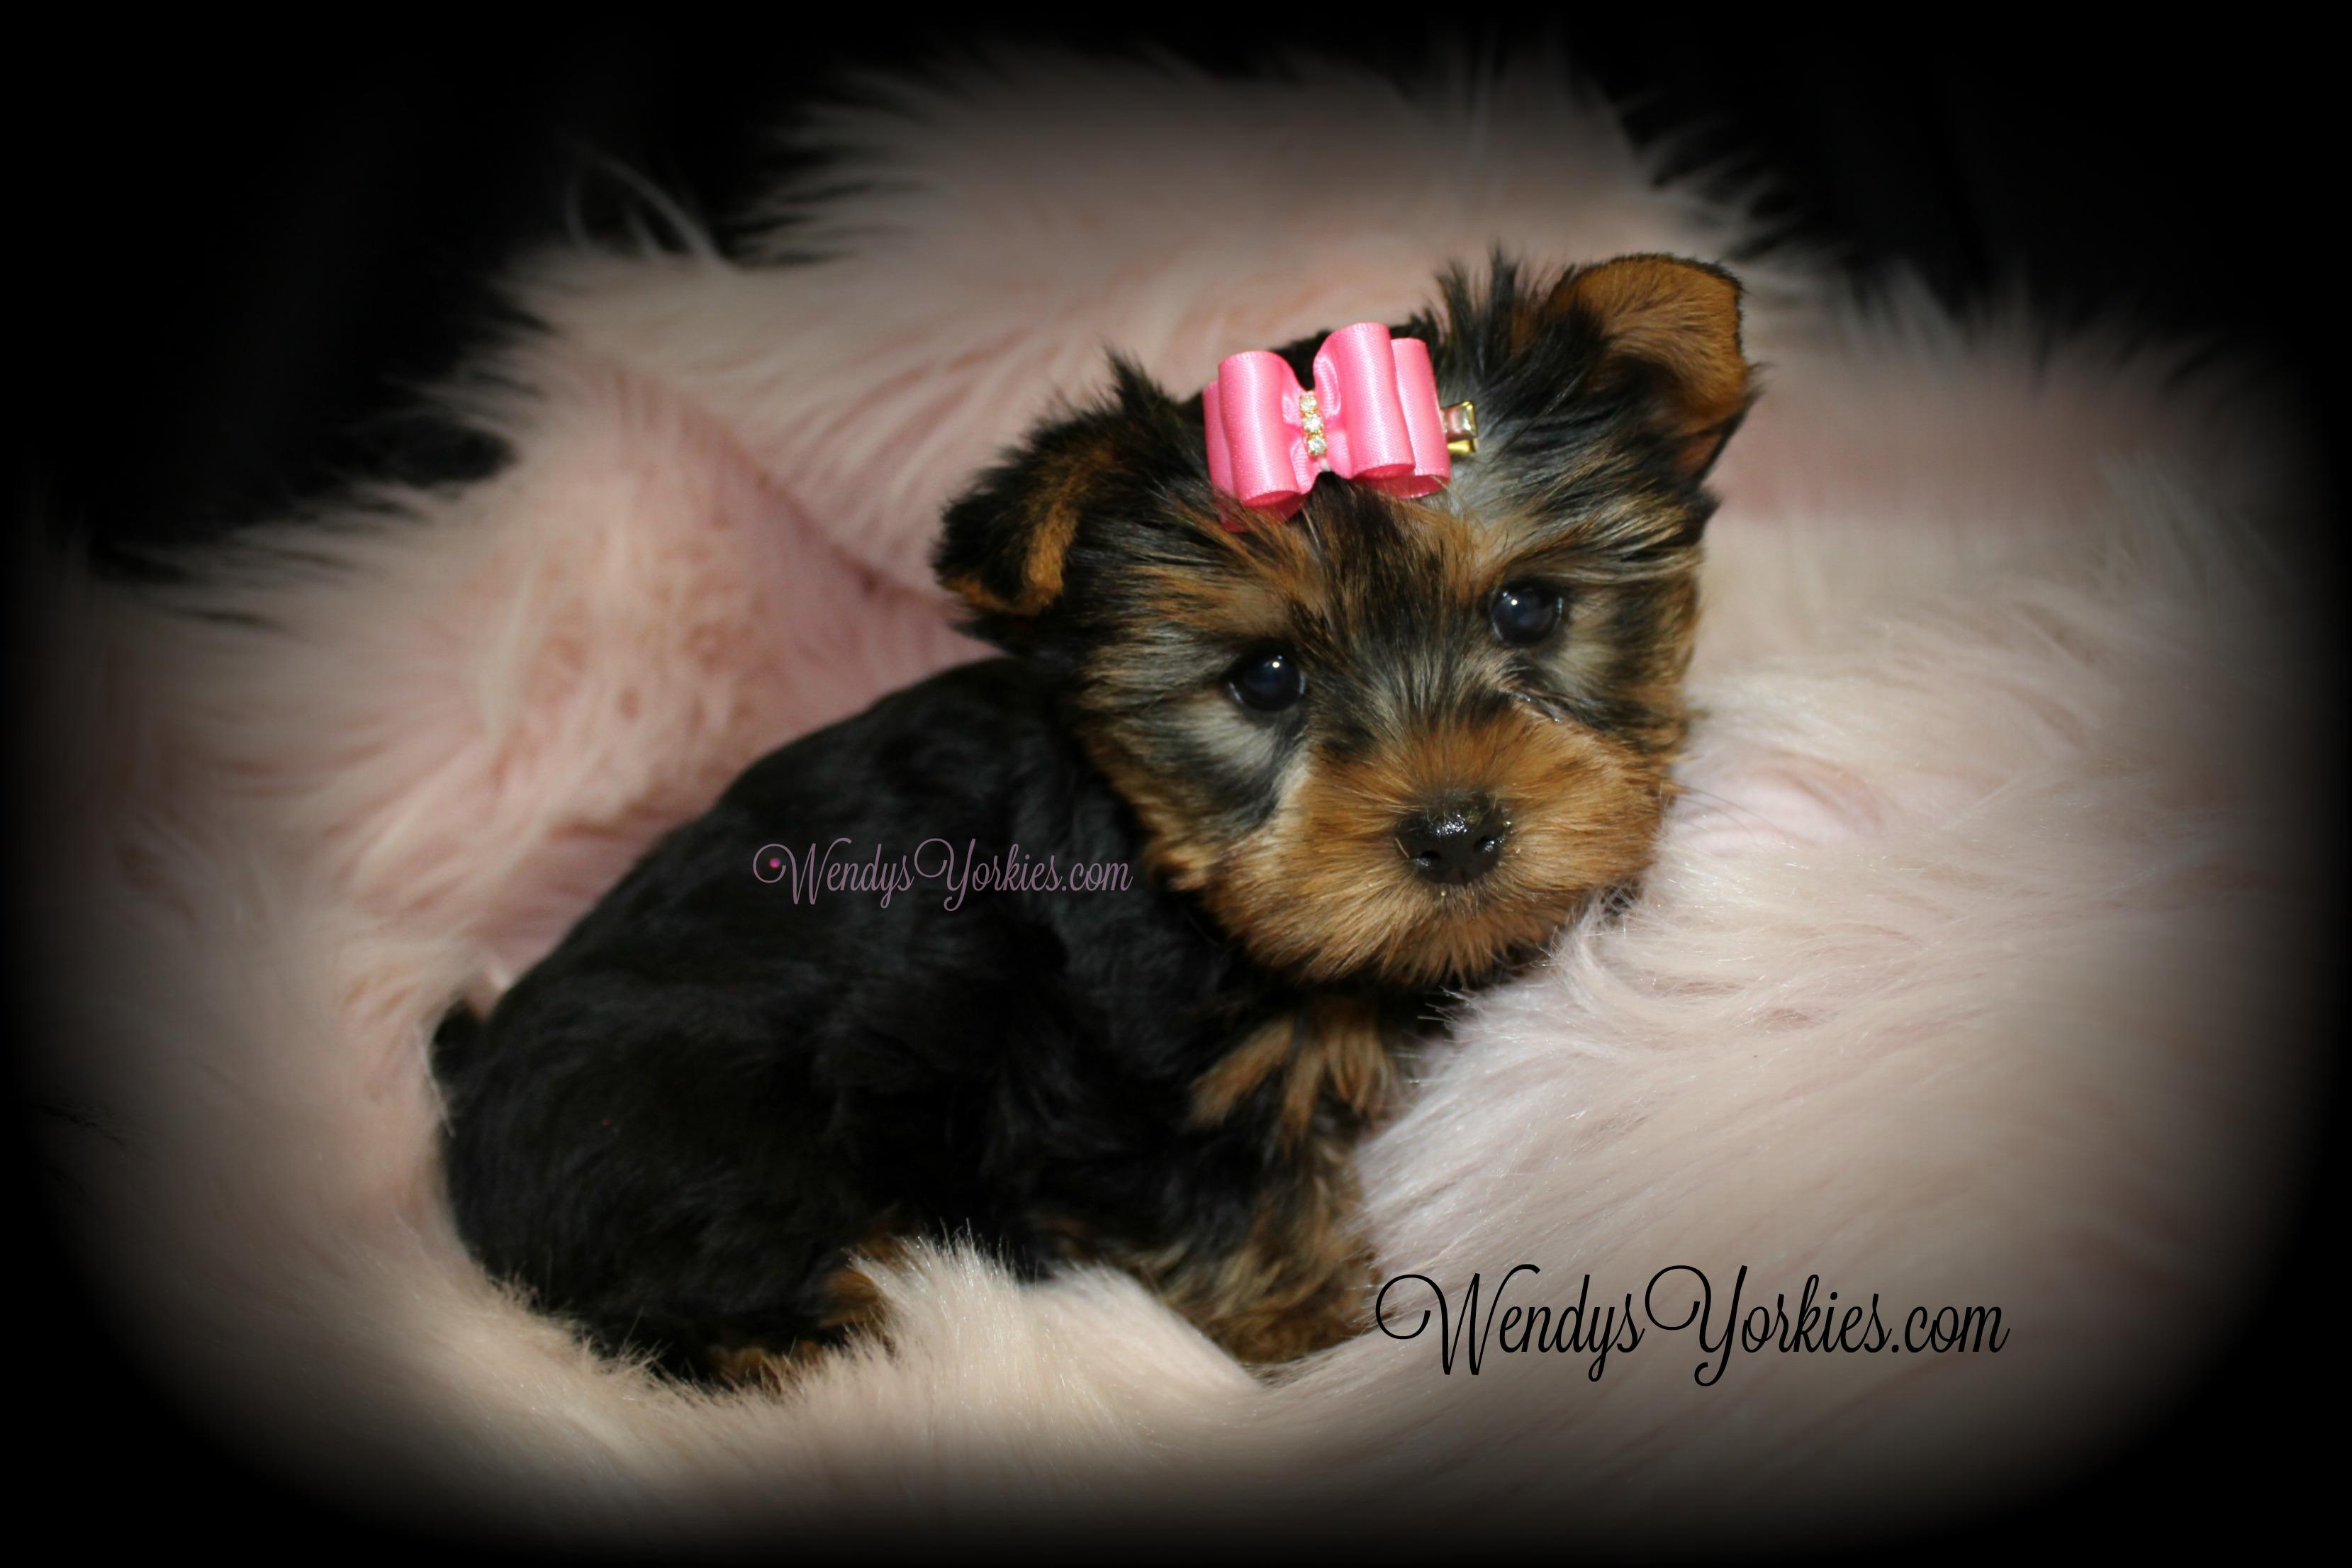 Toy Yorkie puppy for sale, WendysYorkies.com, Star f1